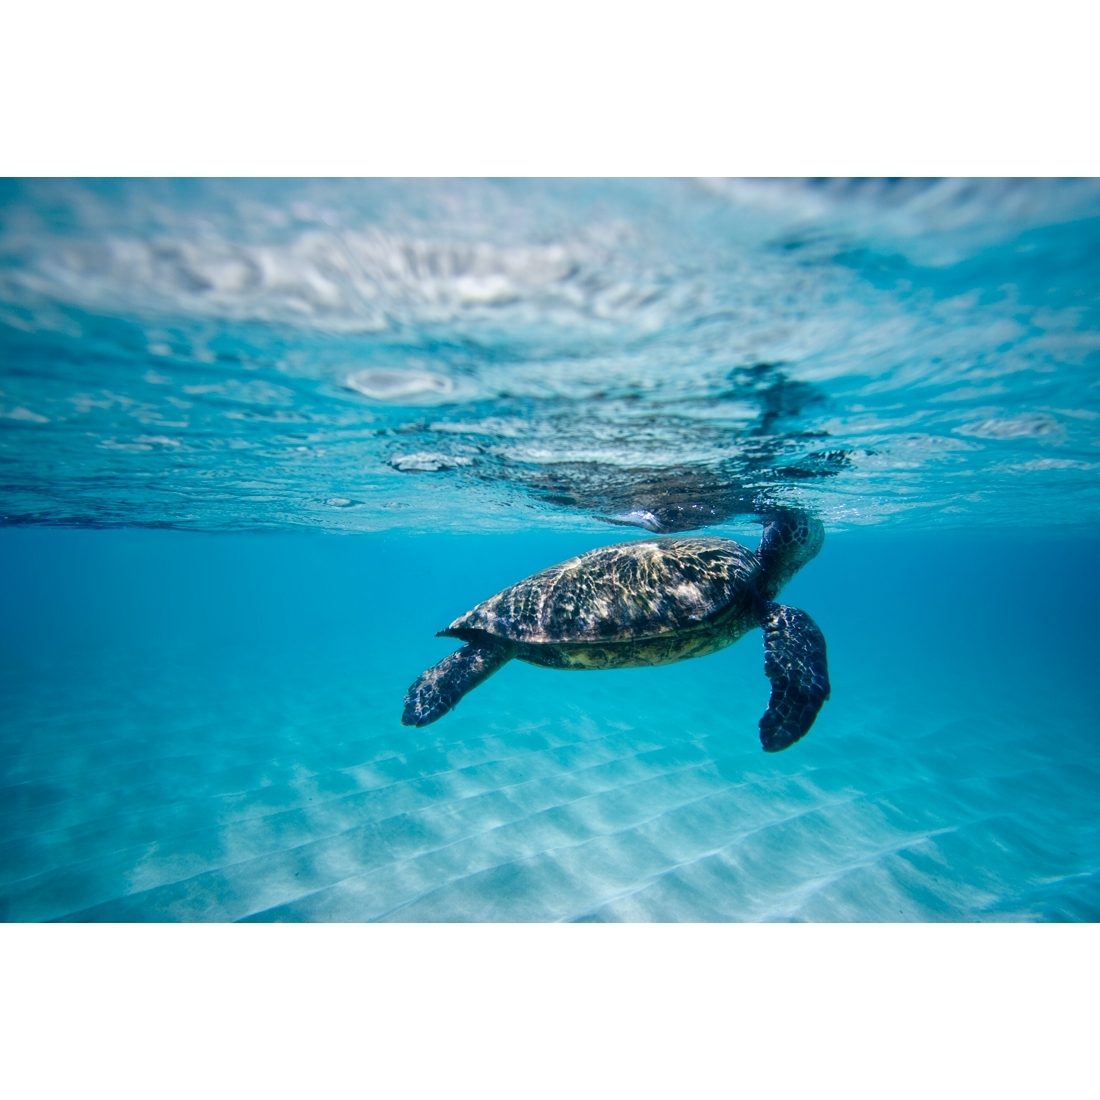 Waimea Turtle – Canvas Print – Wall Art – Australia Regarding Most Current Sea Turtle Canvas Wall Art (View 20 of 20)